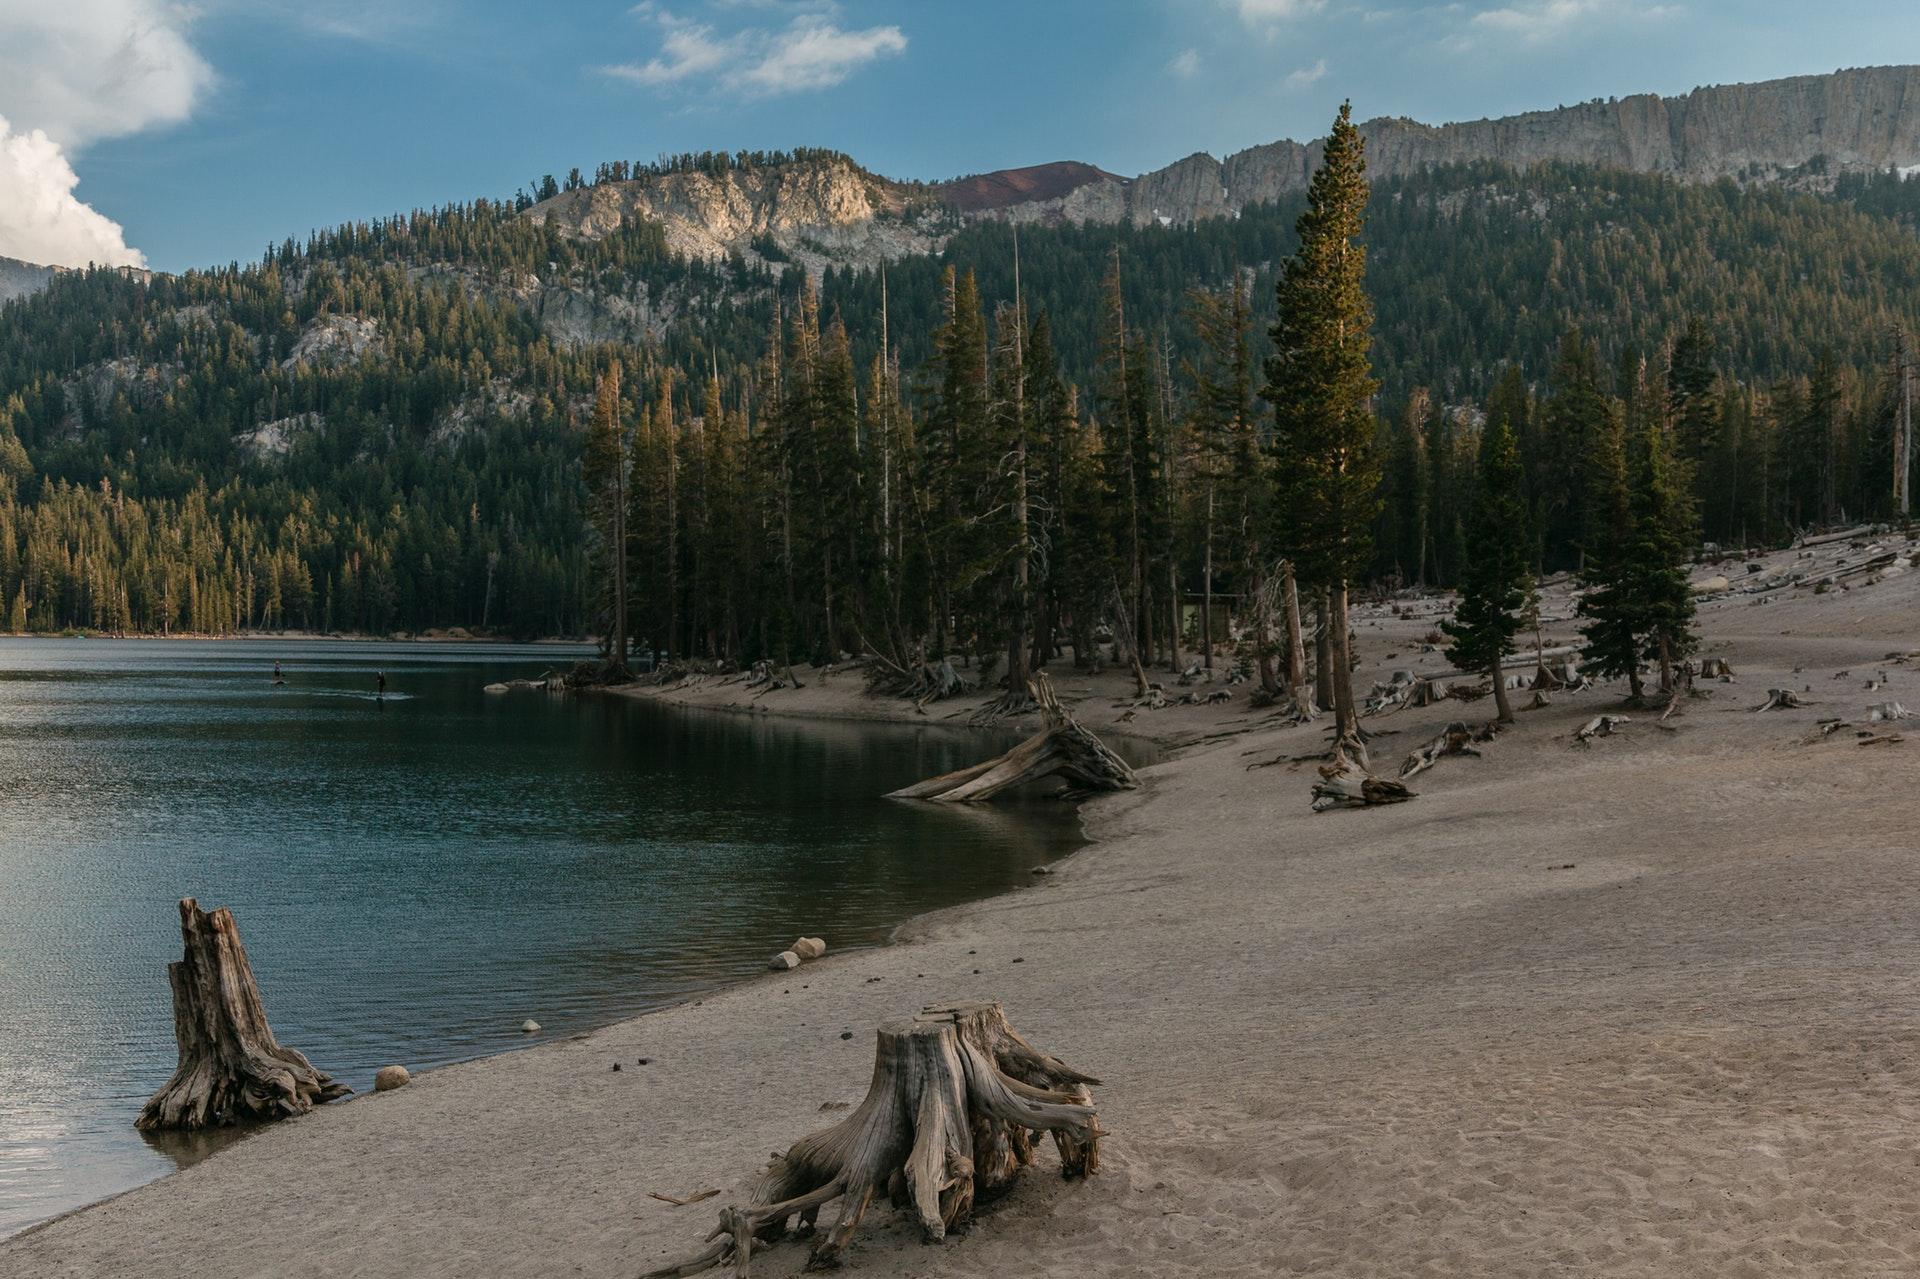 Environment Now California Program